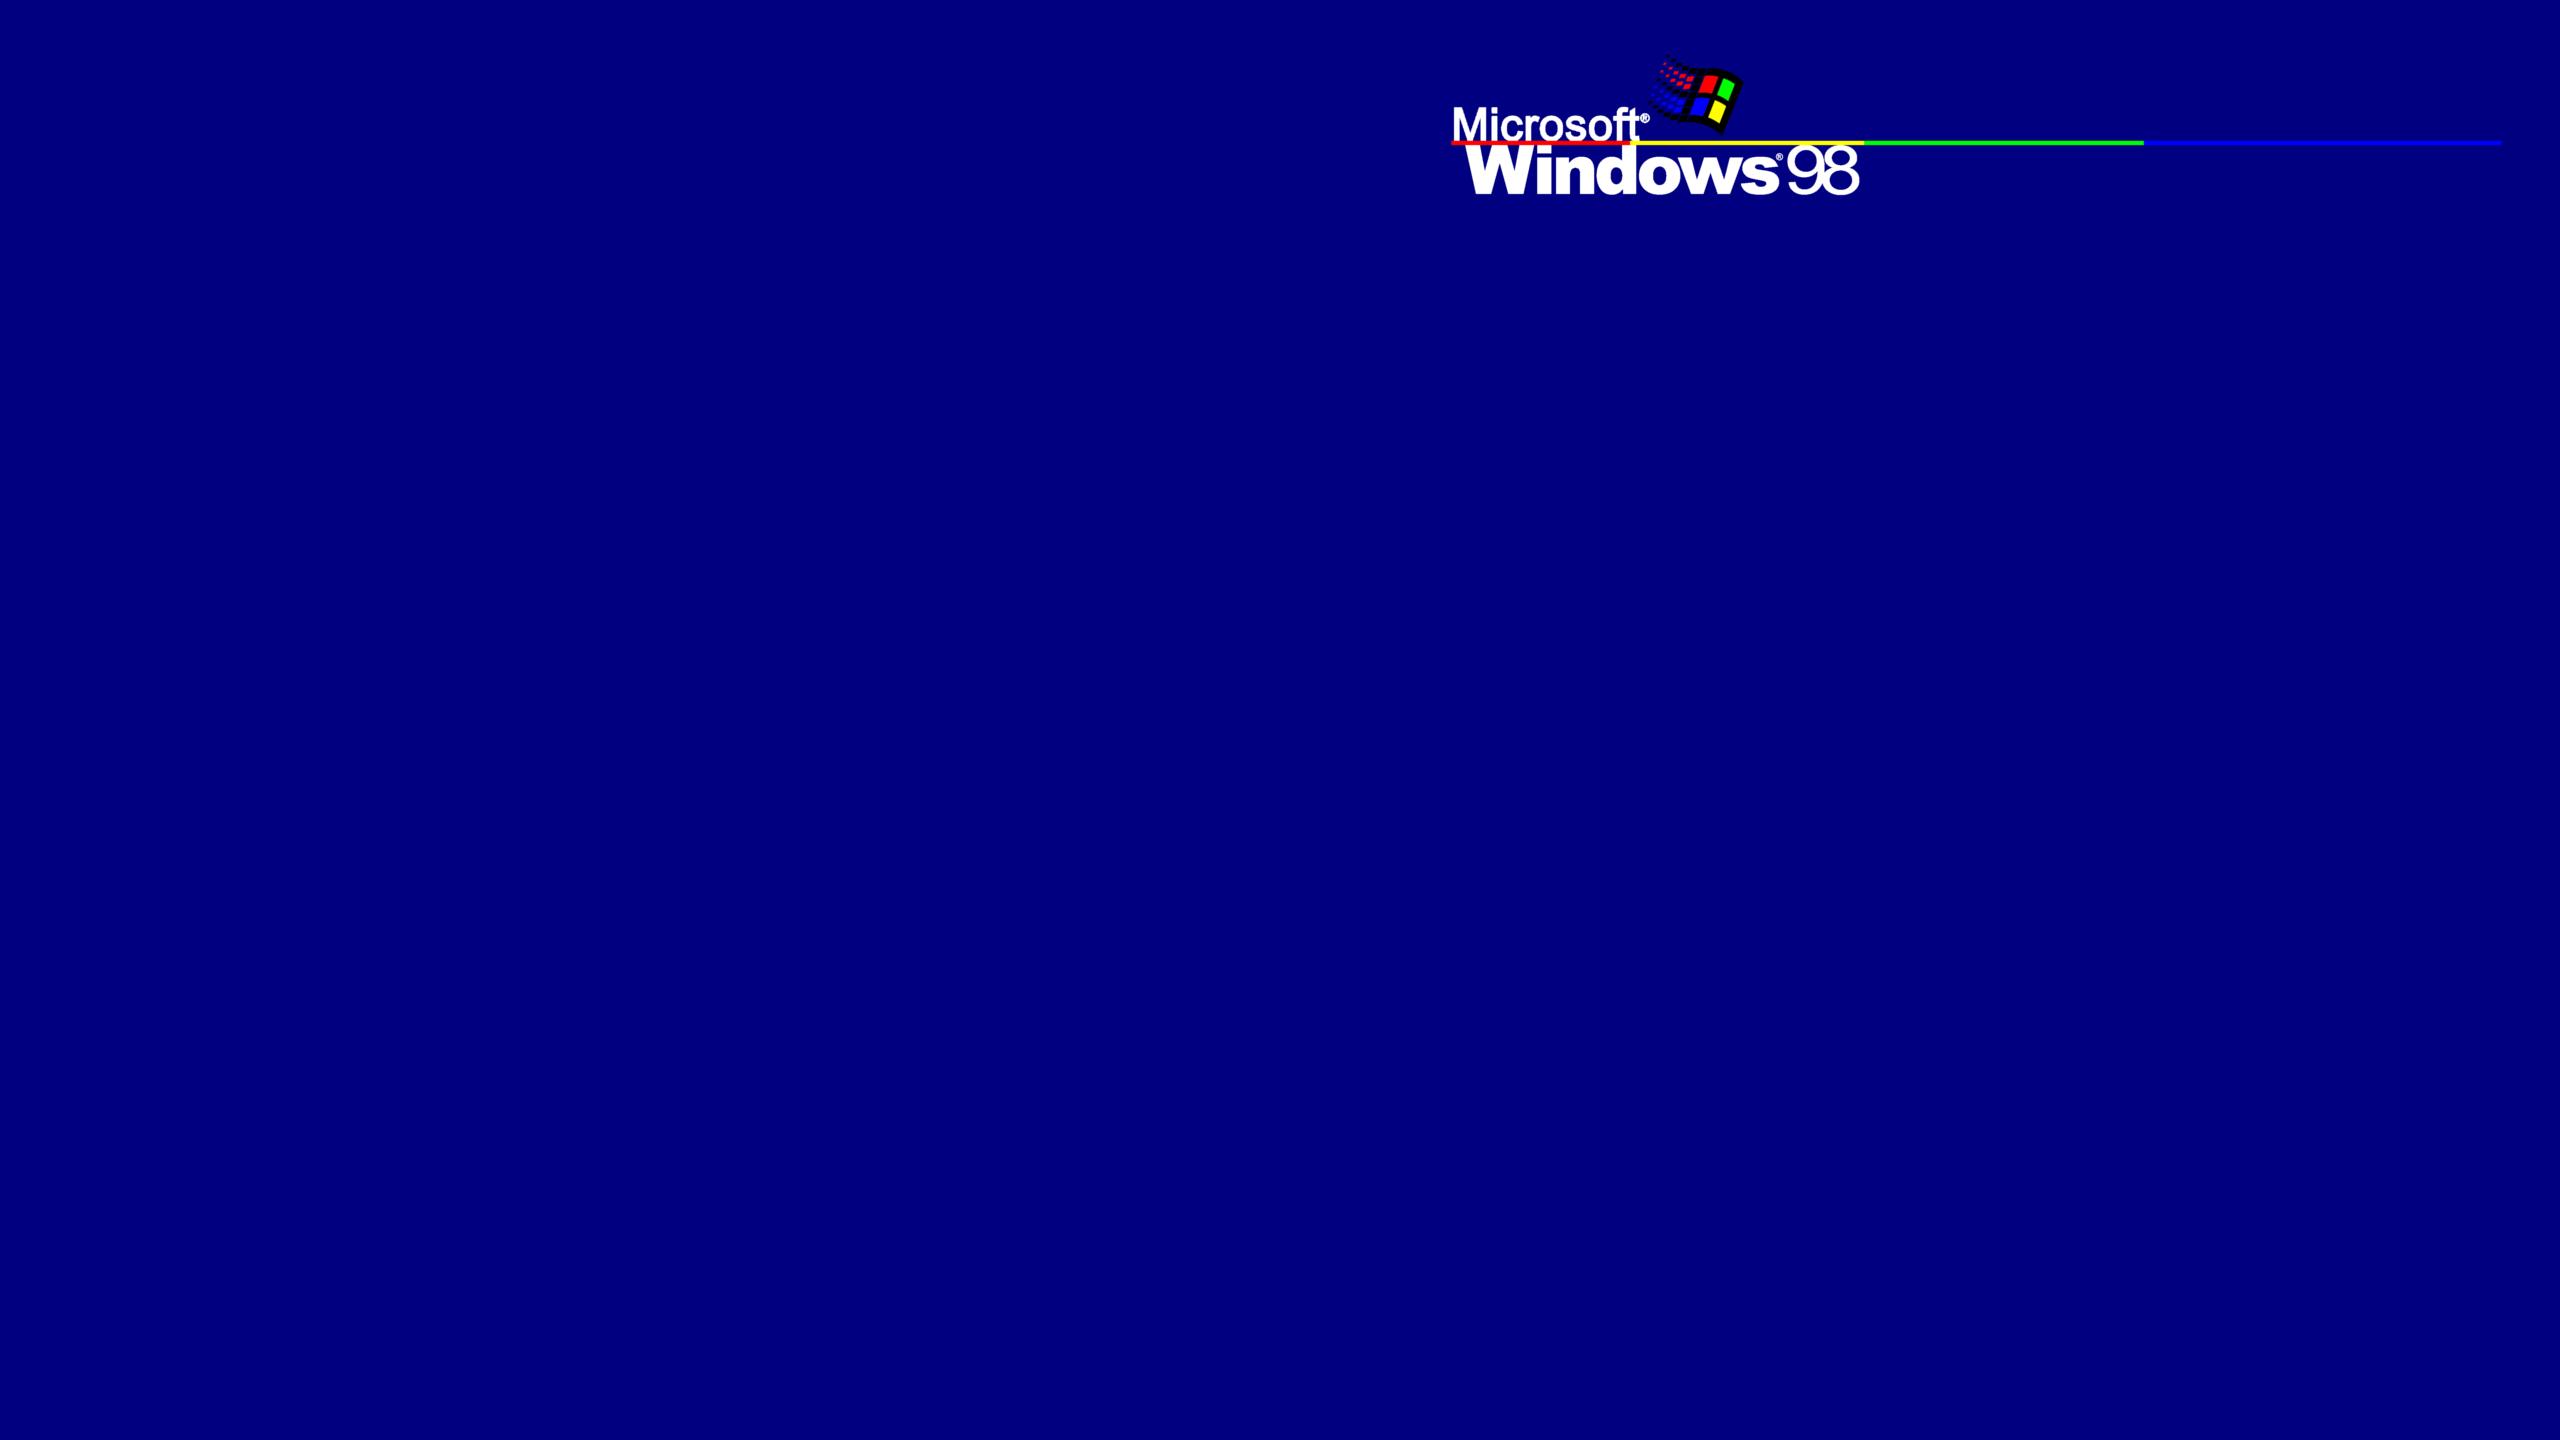 Windows 98 Backgrounds